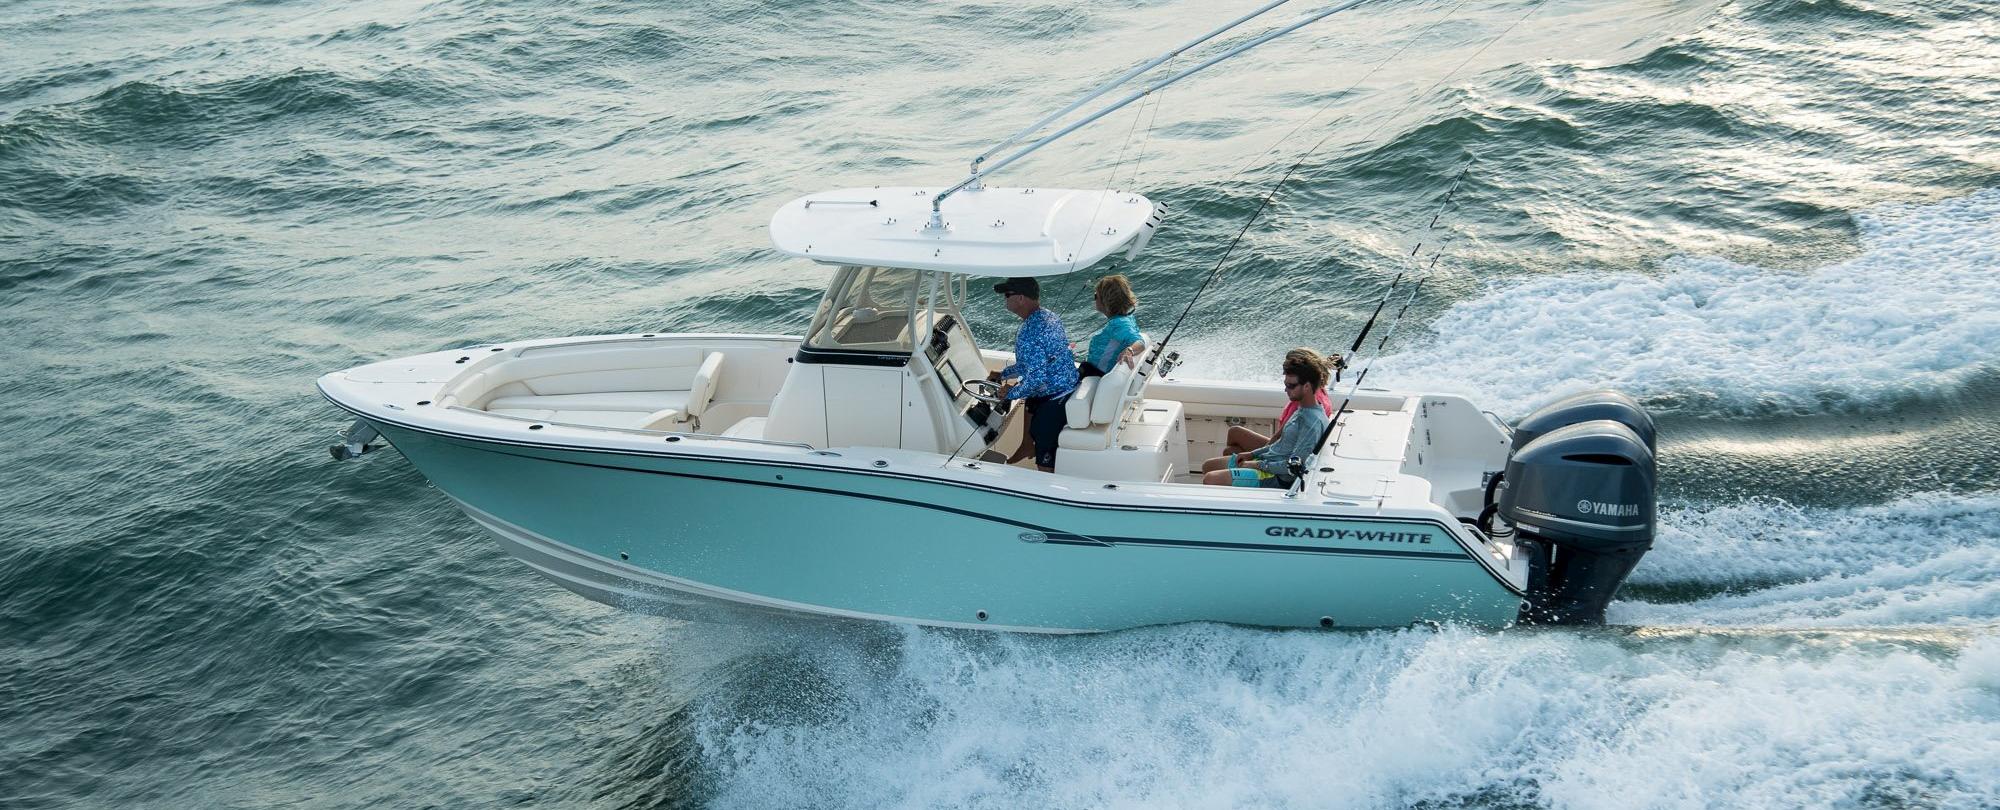 grady white boat